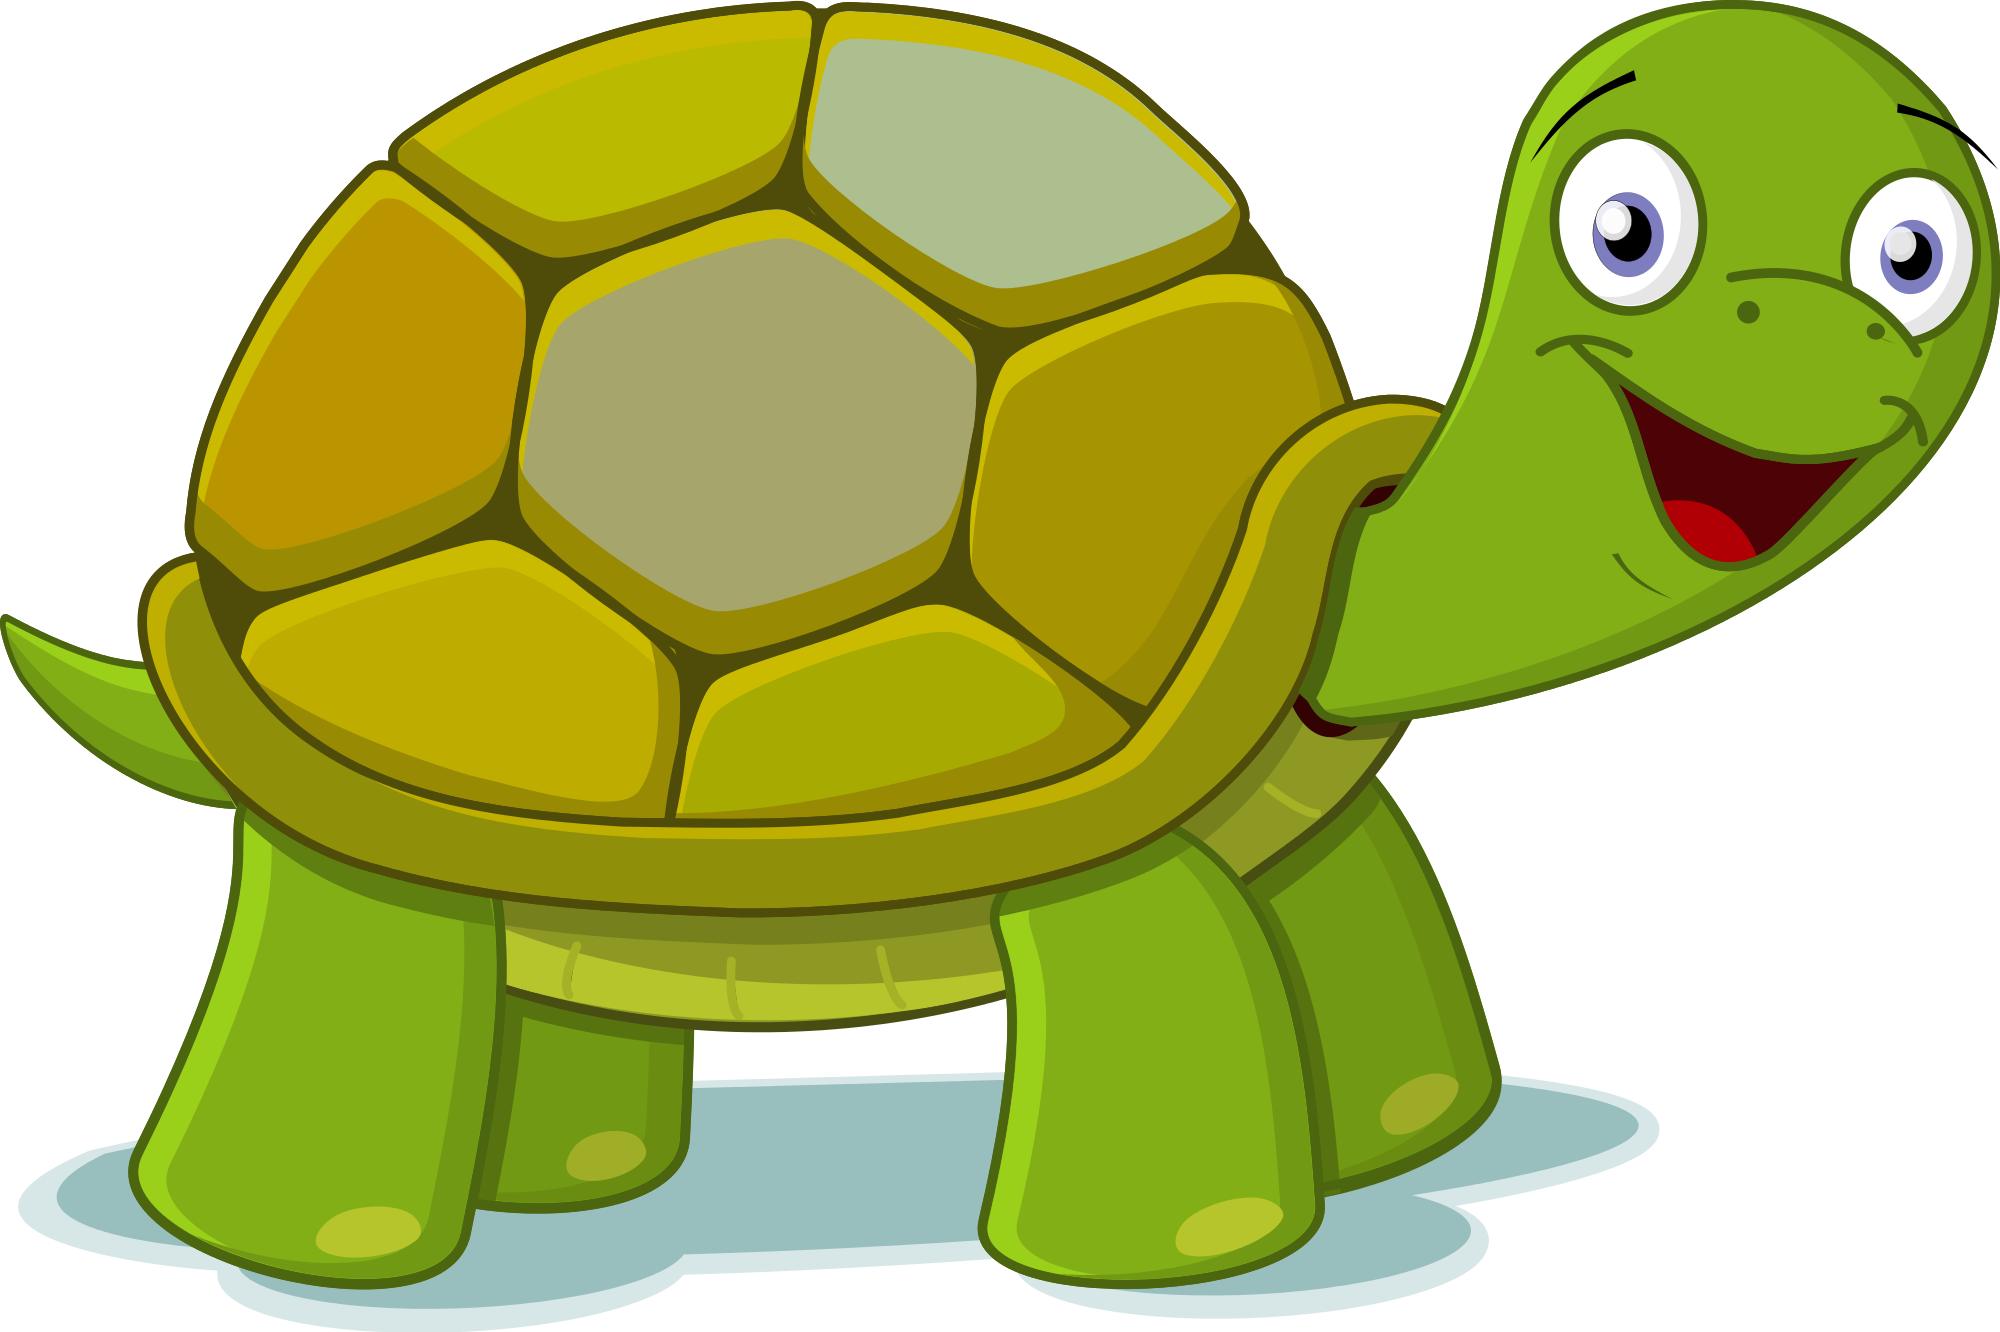 Svg clip art clipart free stock File:Turtle clip art.svg - Wikimedia Commons clipart free stock